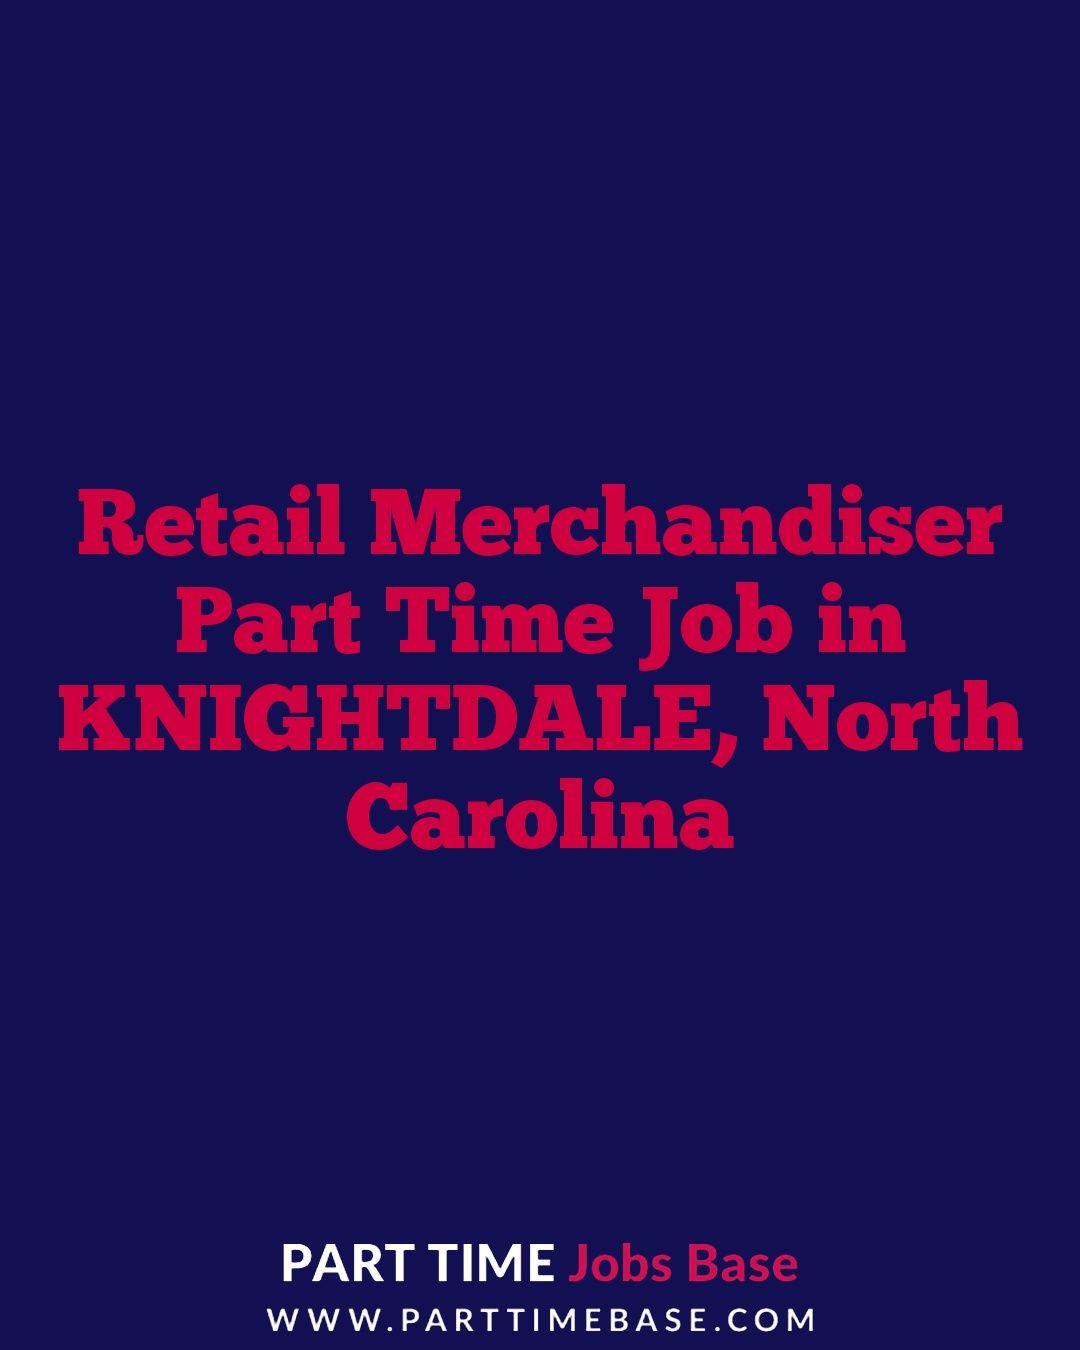 Retail merchandiser part time job in knightdale parttime